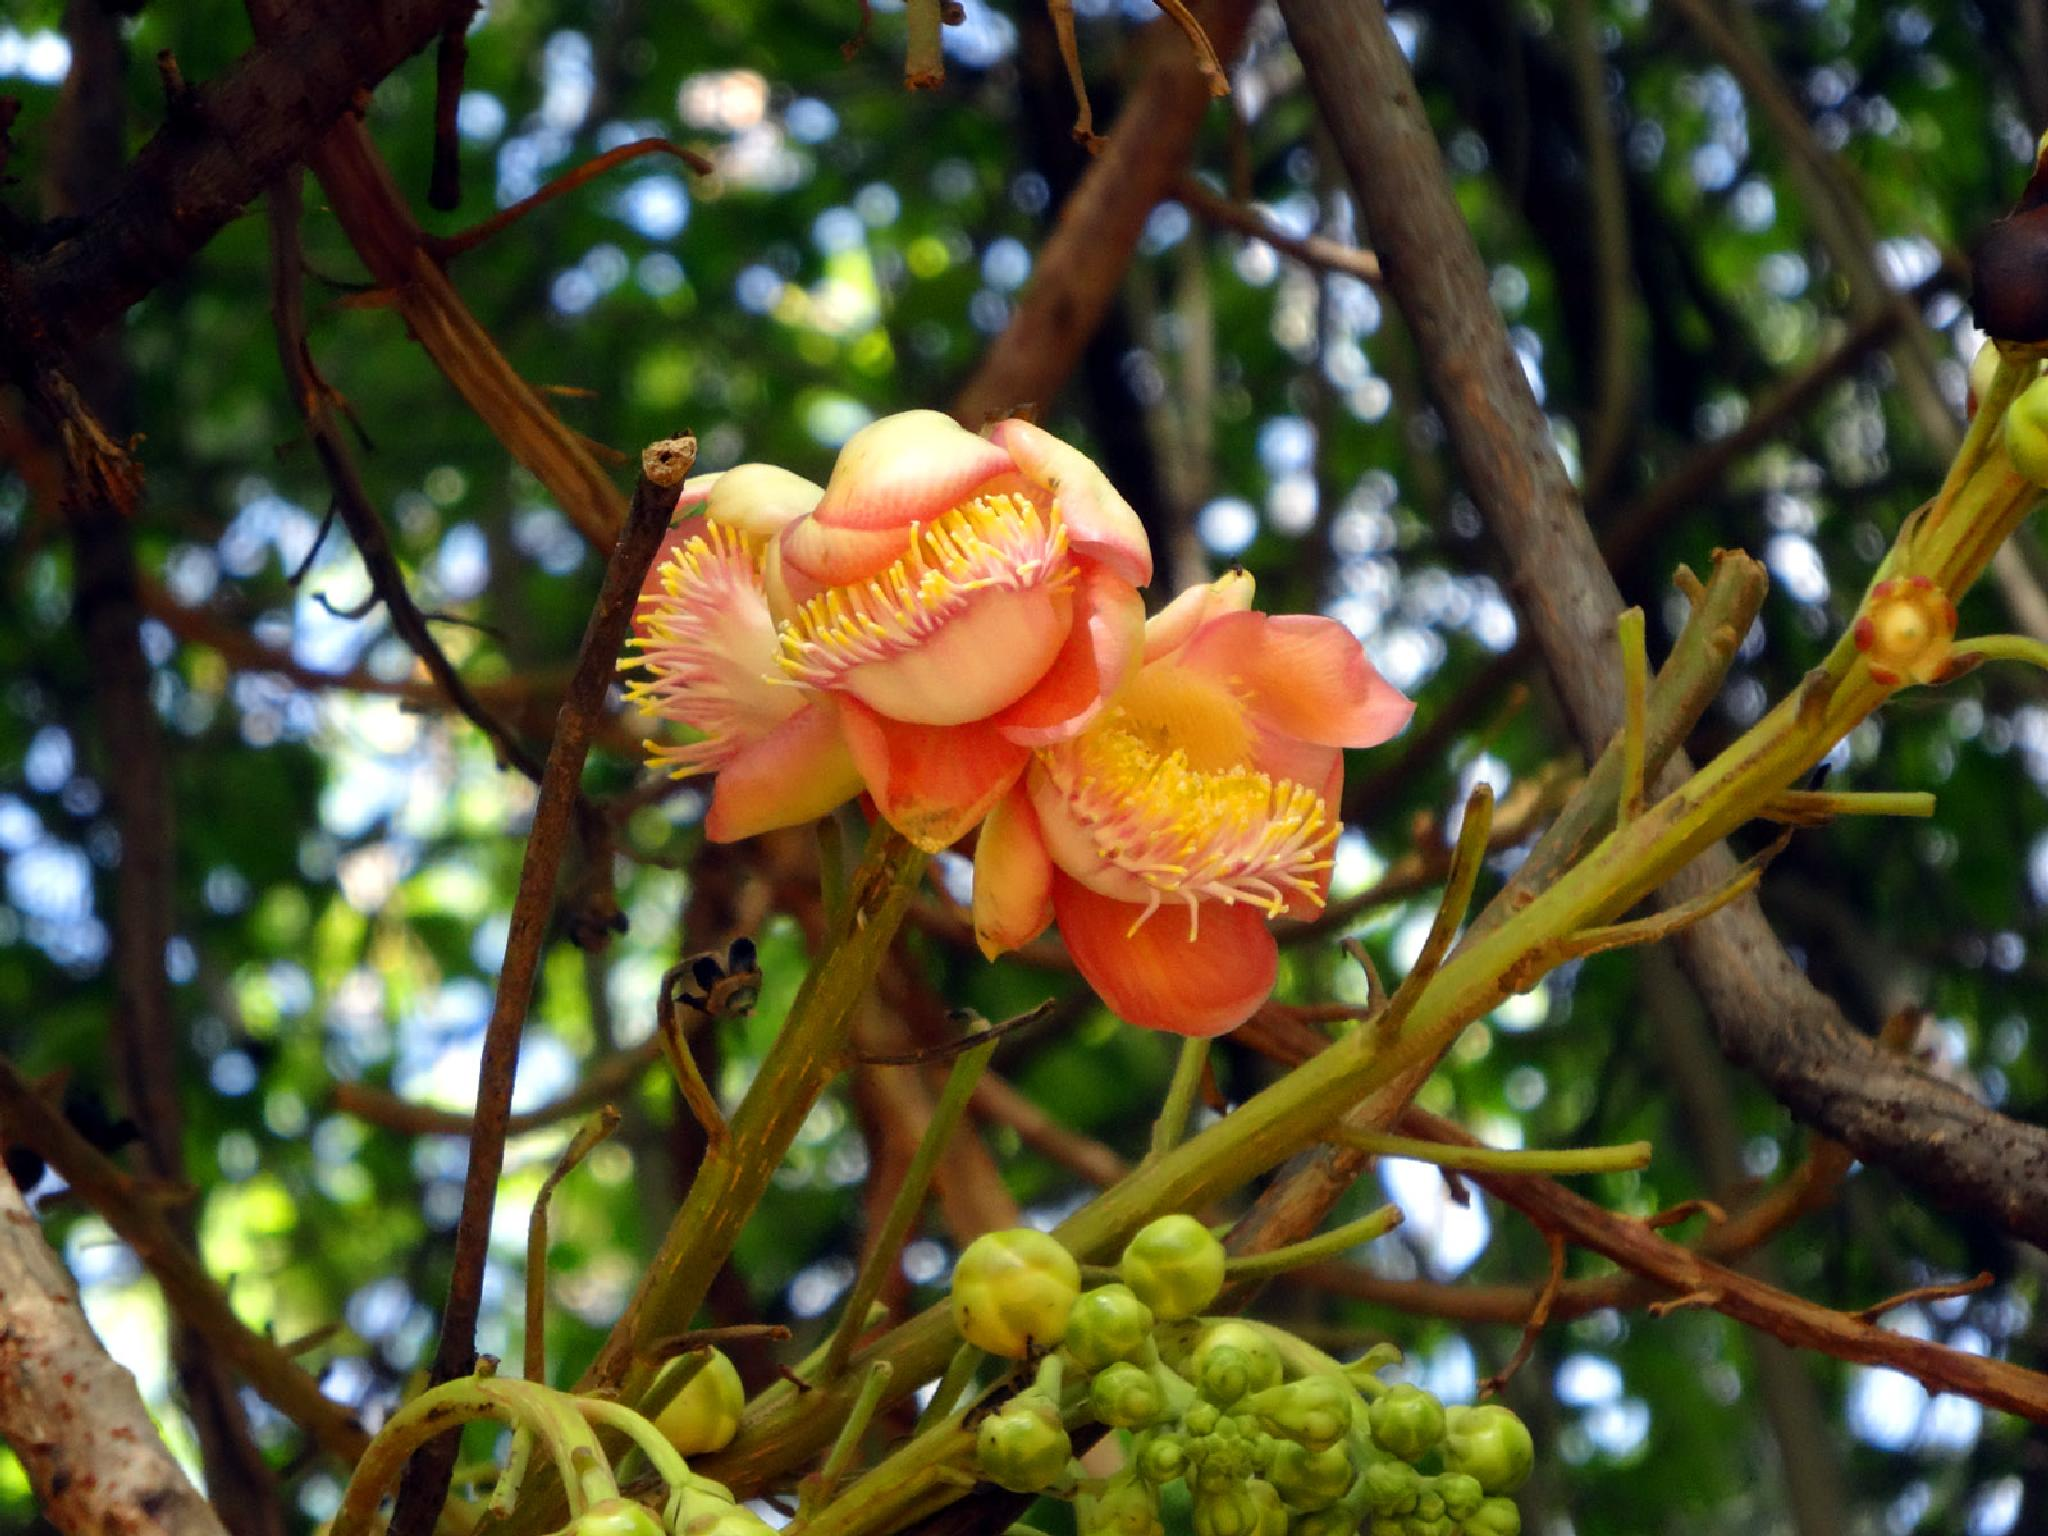 Cannonball flower by Krishna Rao D